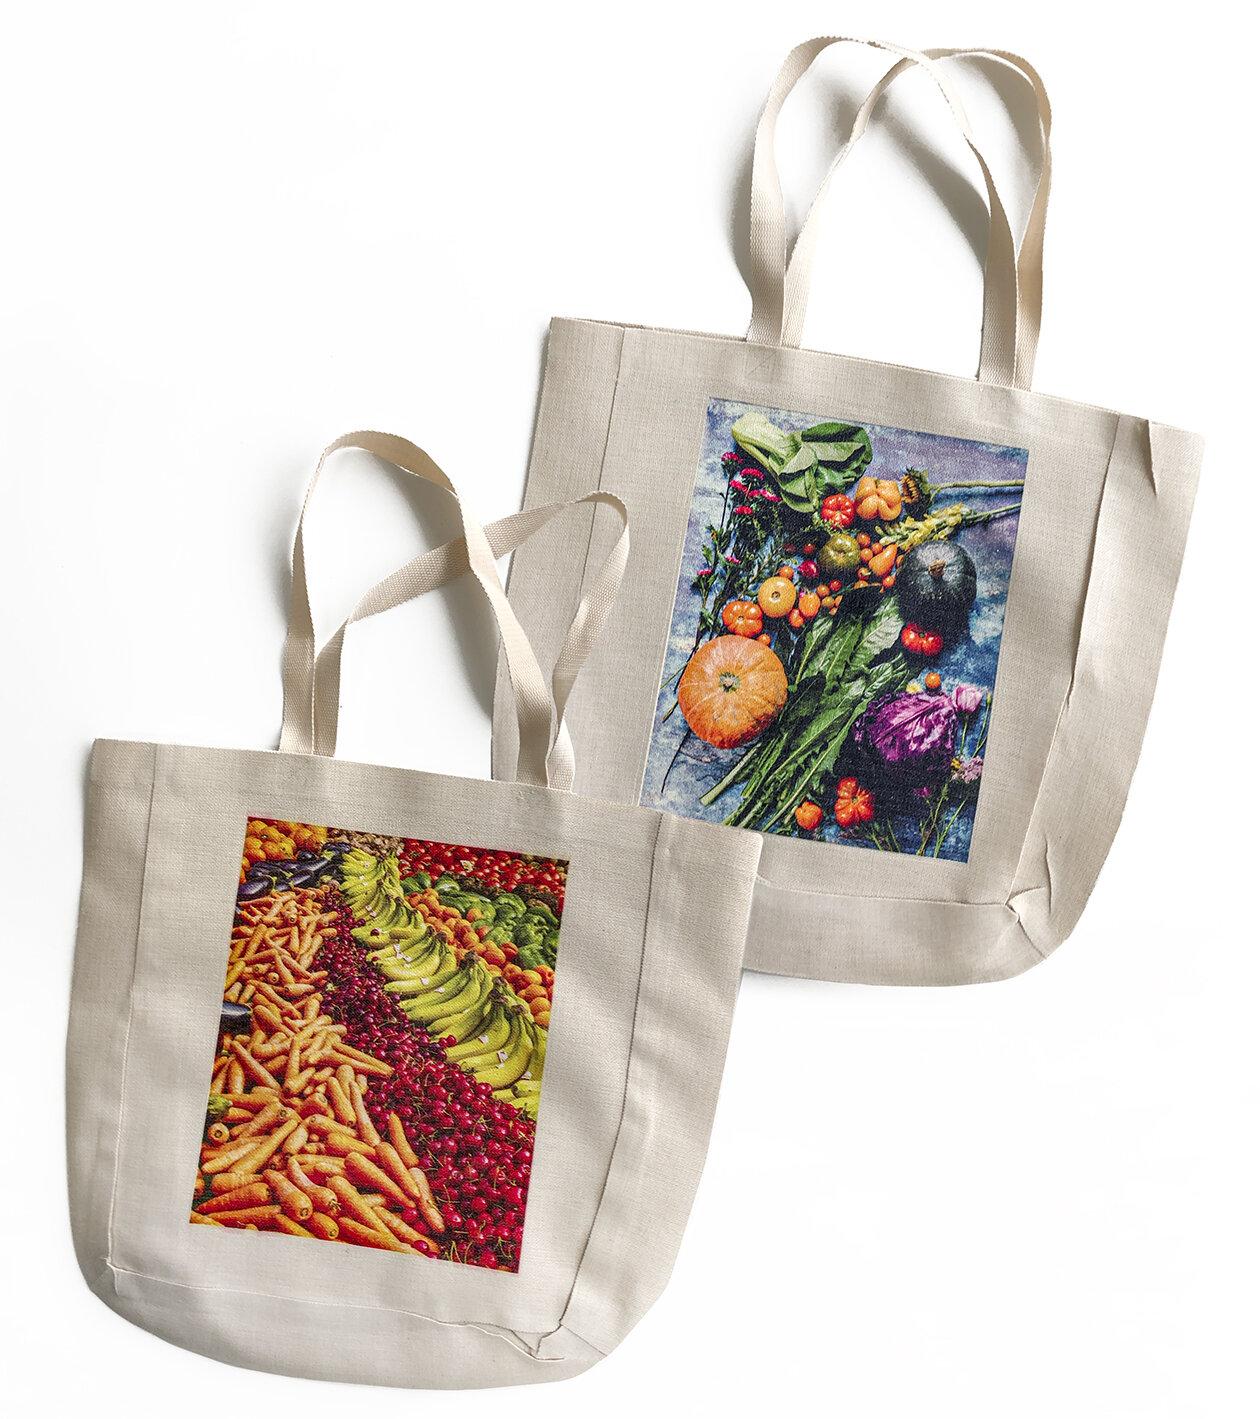 15x15 reusable Linen Bags